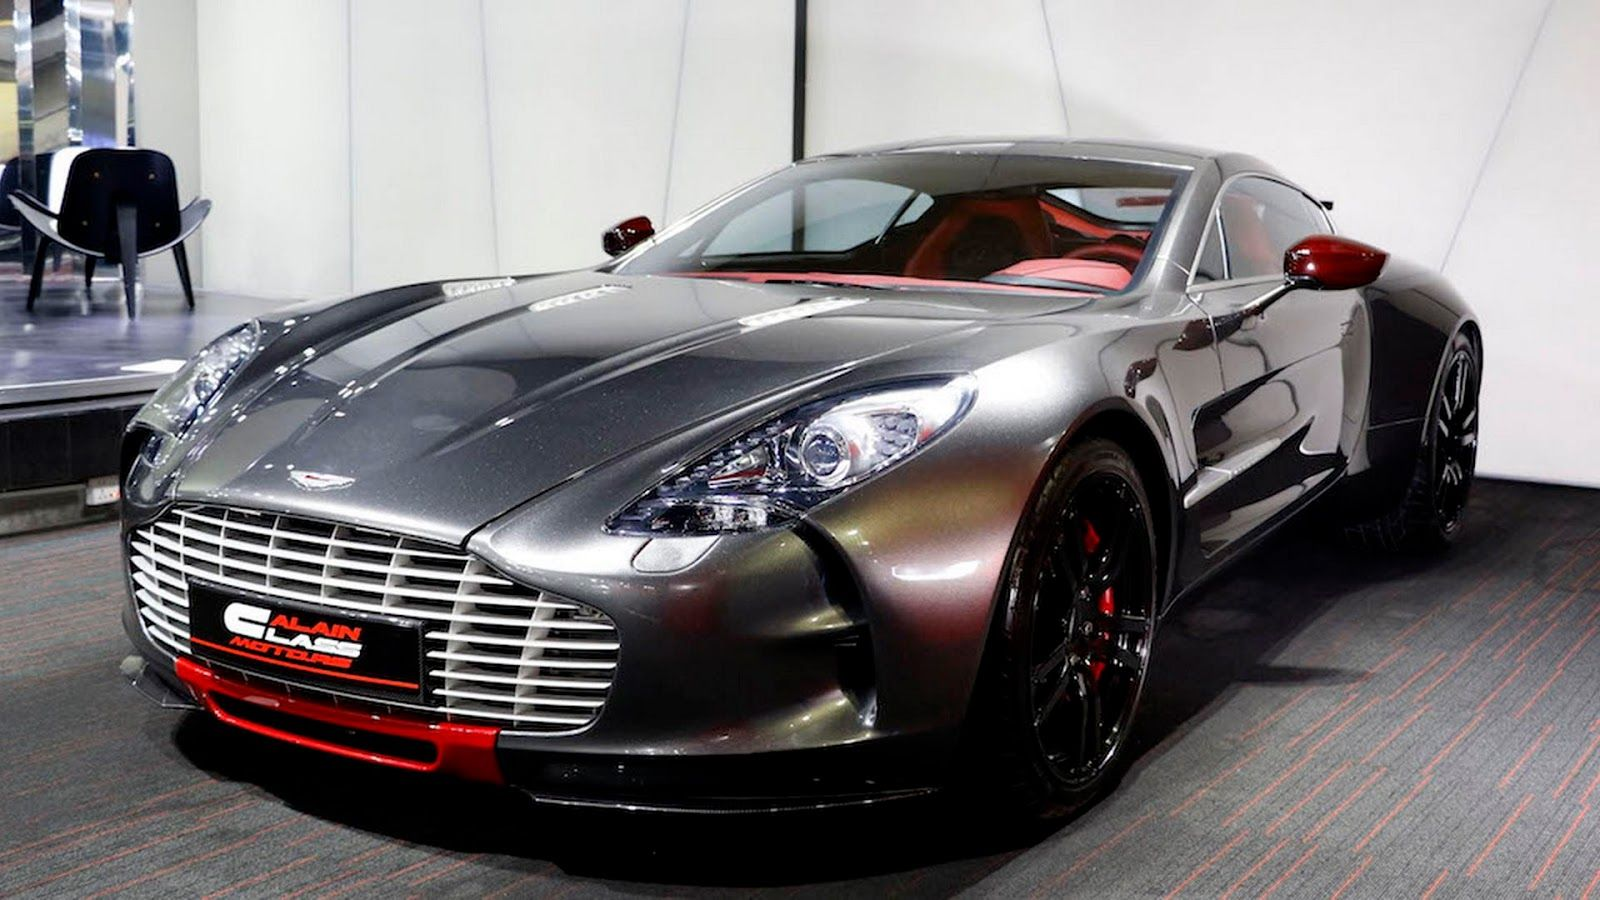 Ultra Rare Aston Martin One 77 Q Series For Sale In Dubai With